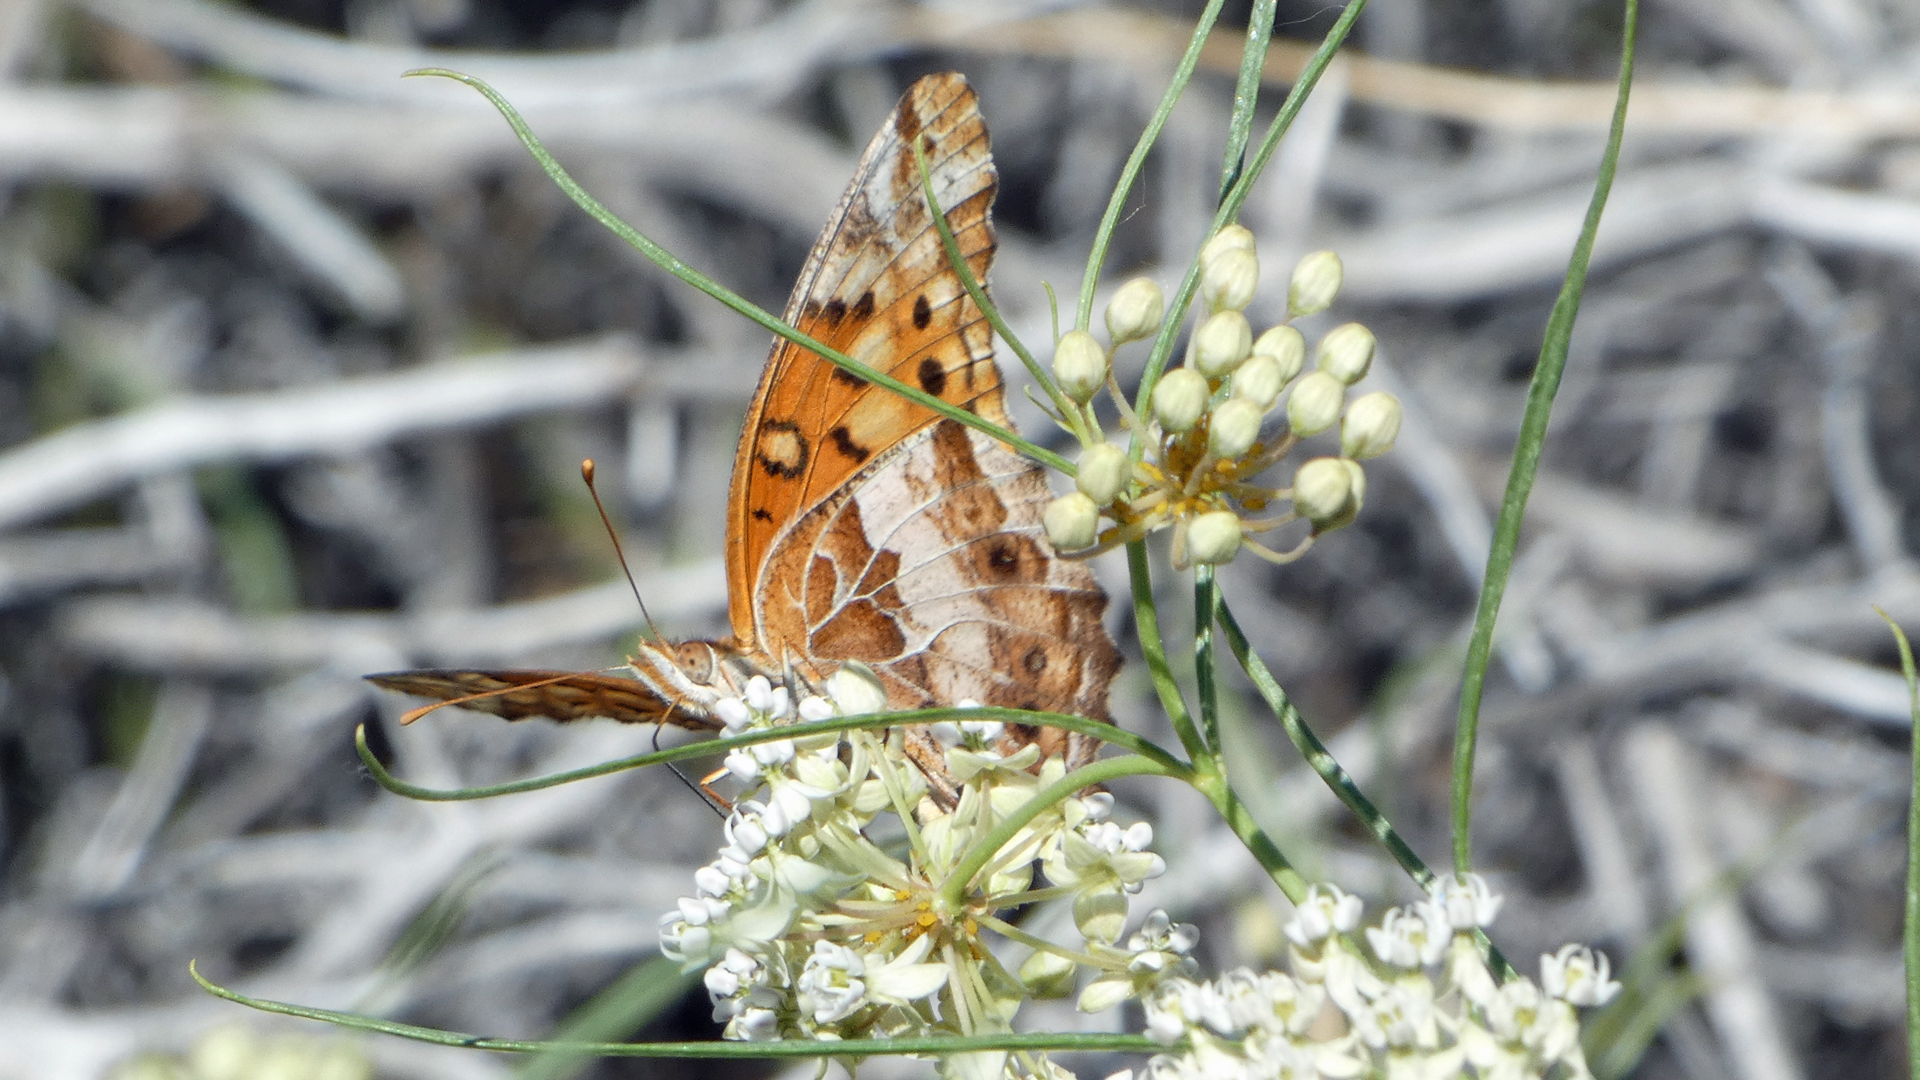 On horsetail milkweed, Albuquerque, August 2021